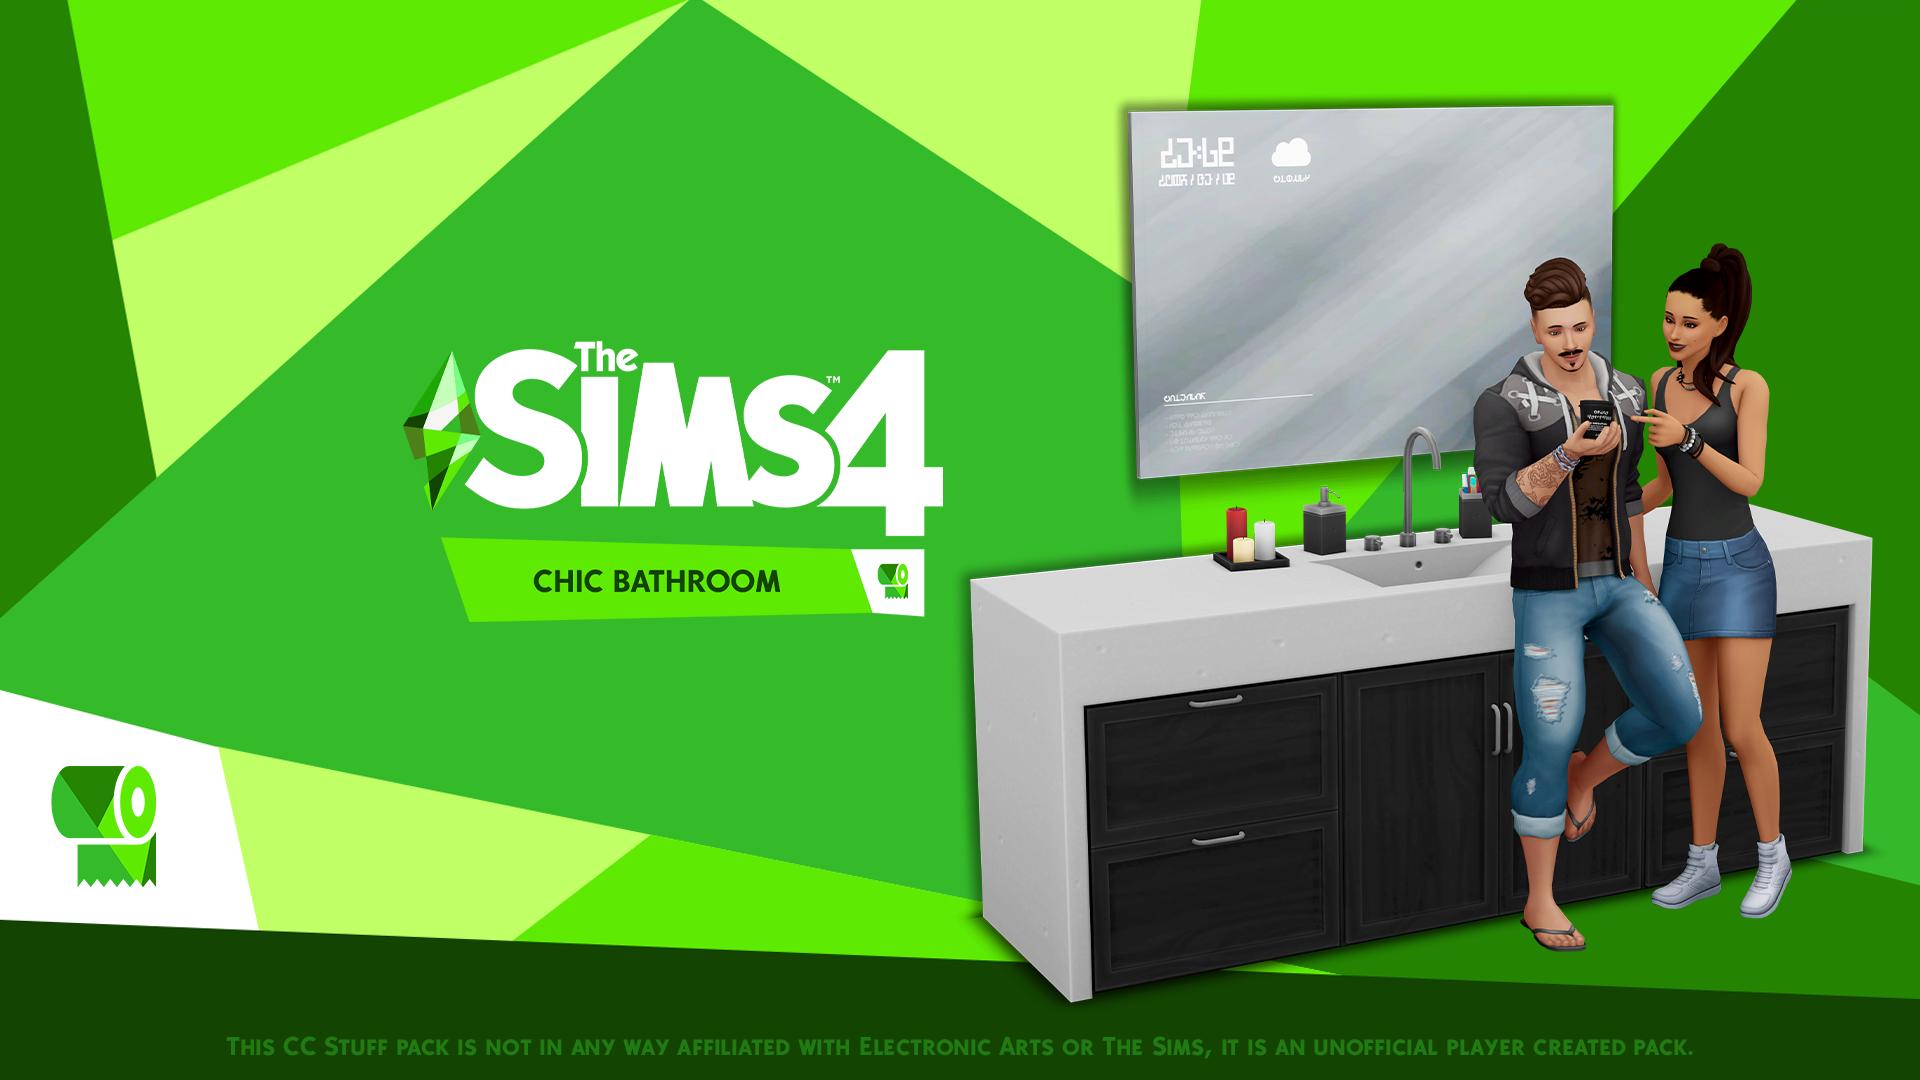 Mod The Sims   The Sims 20 Chic Bathroom   Custom Stuff Pack